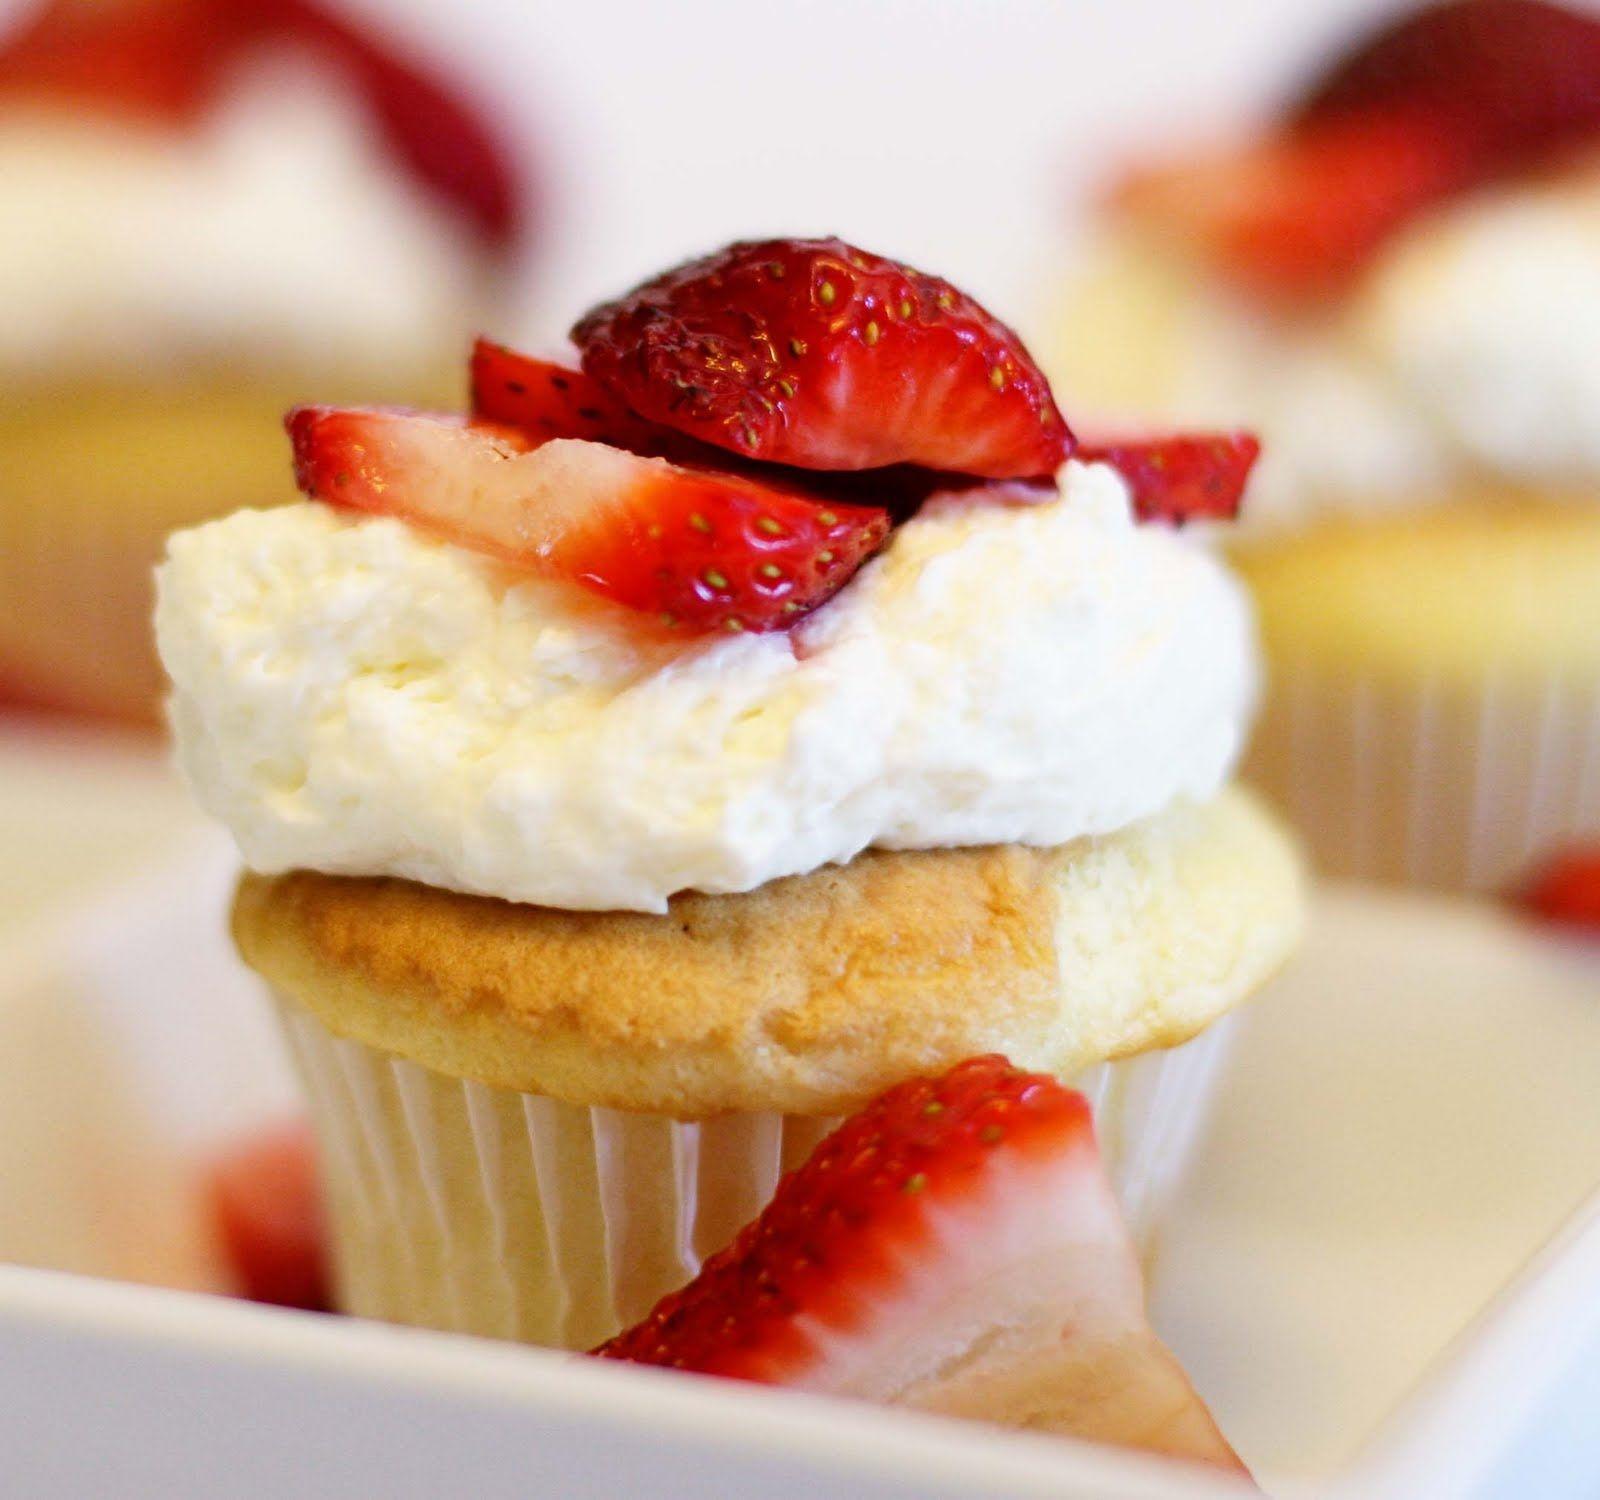 East Providence Ri In Rhode Island Gourmet Cupcakes Dessert Appetizers Dessert Recipes